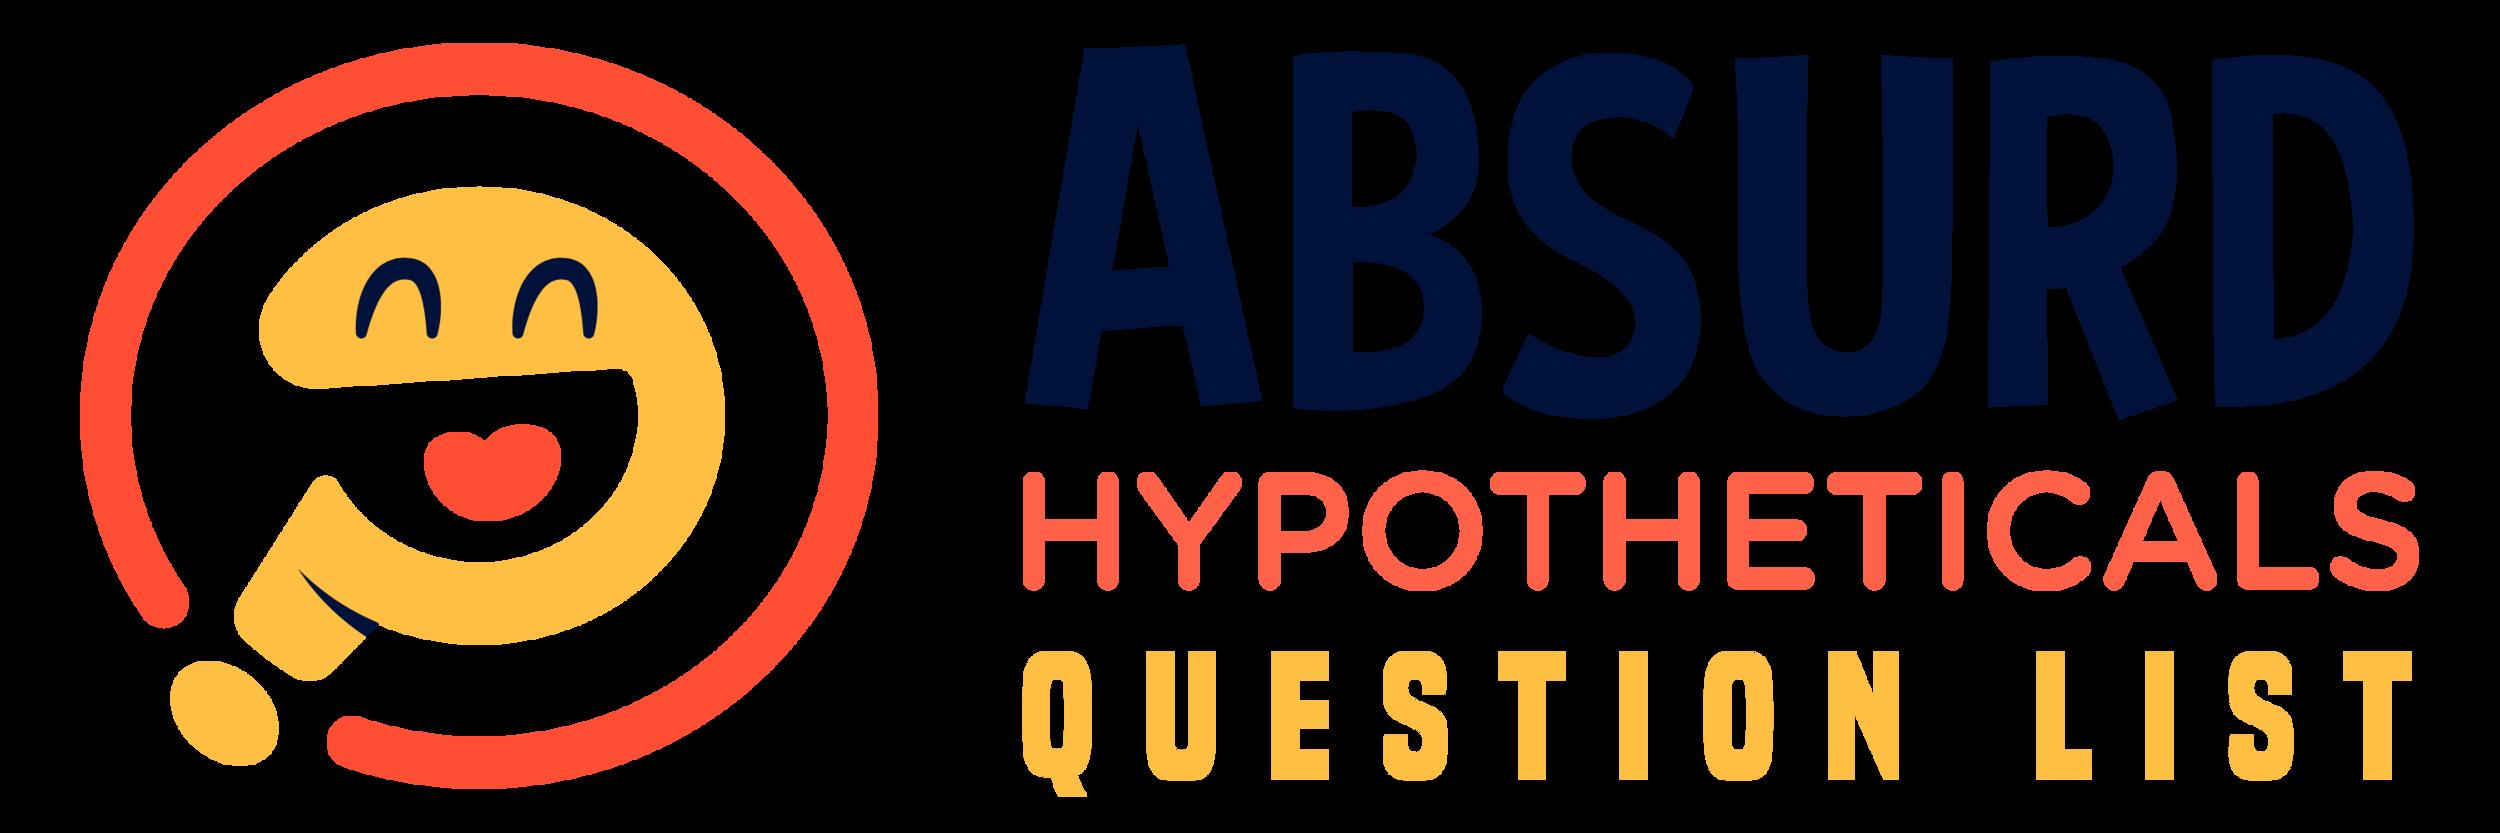 Question List.png